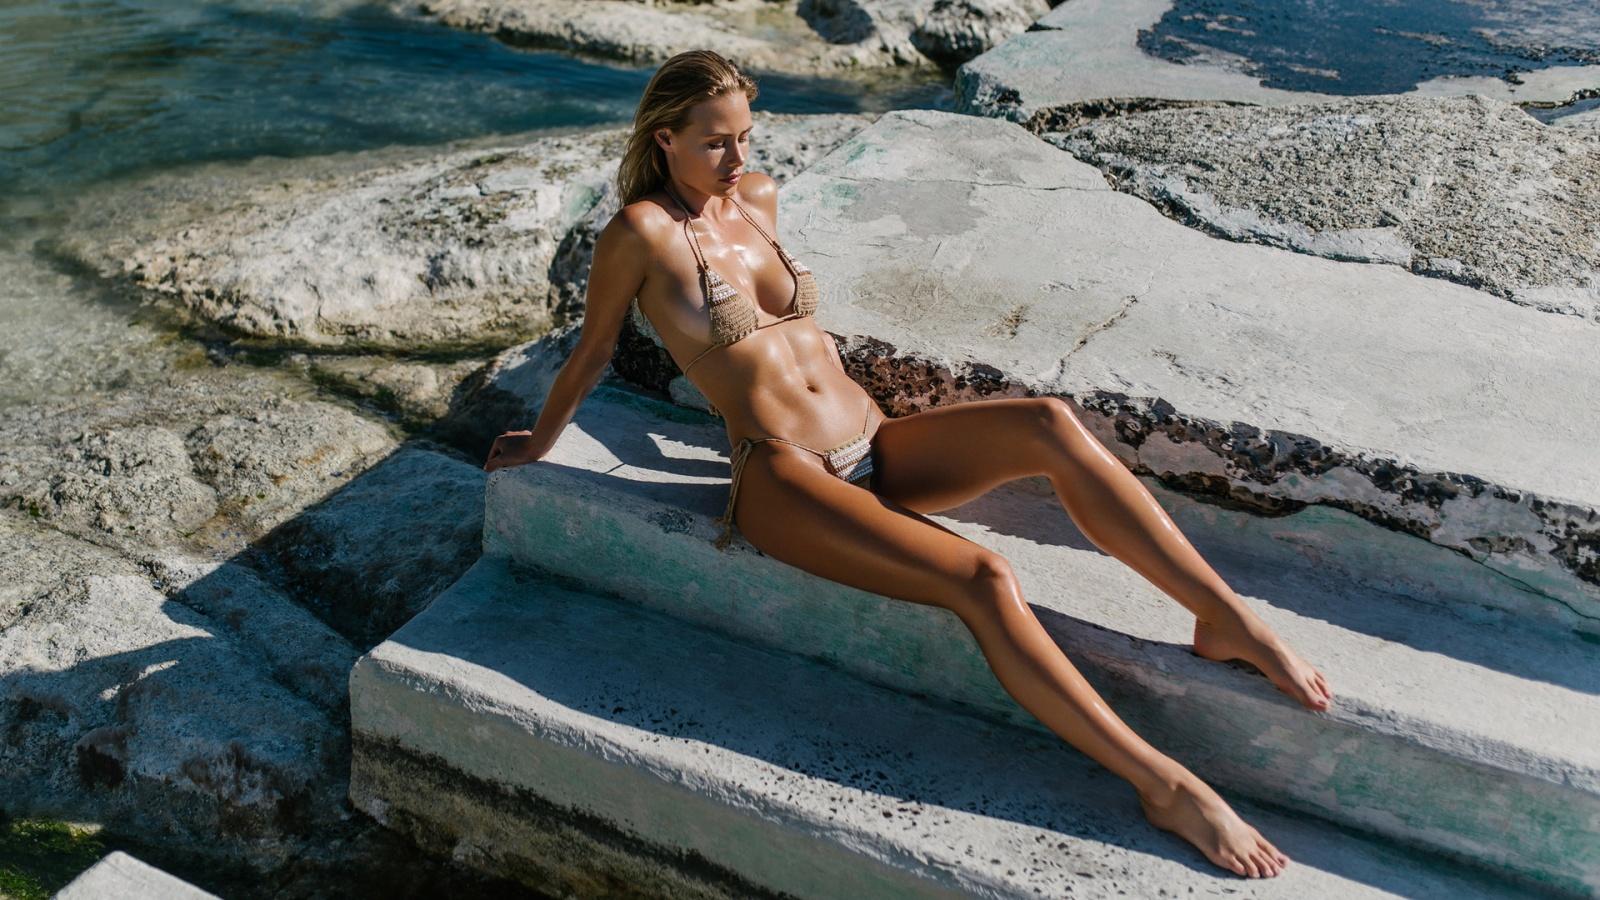 beach bikini voyeur